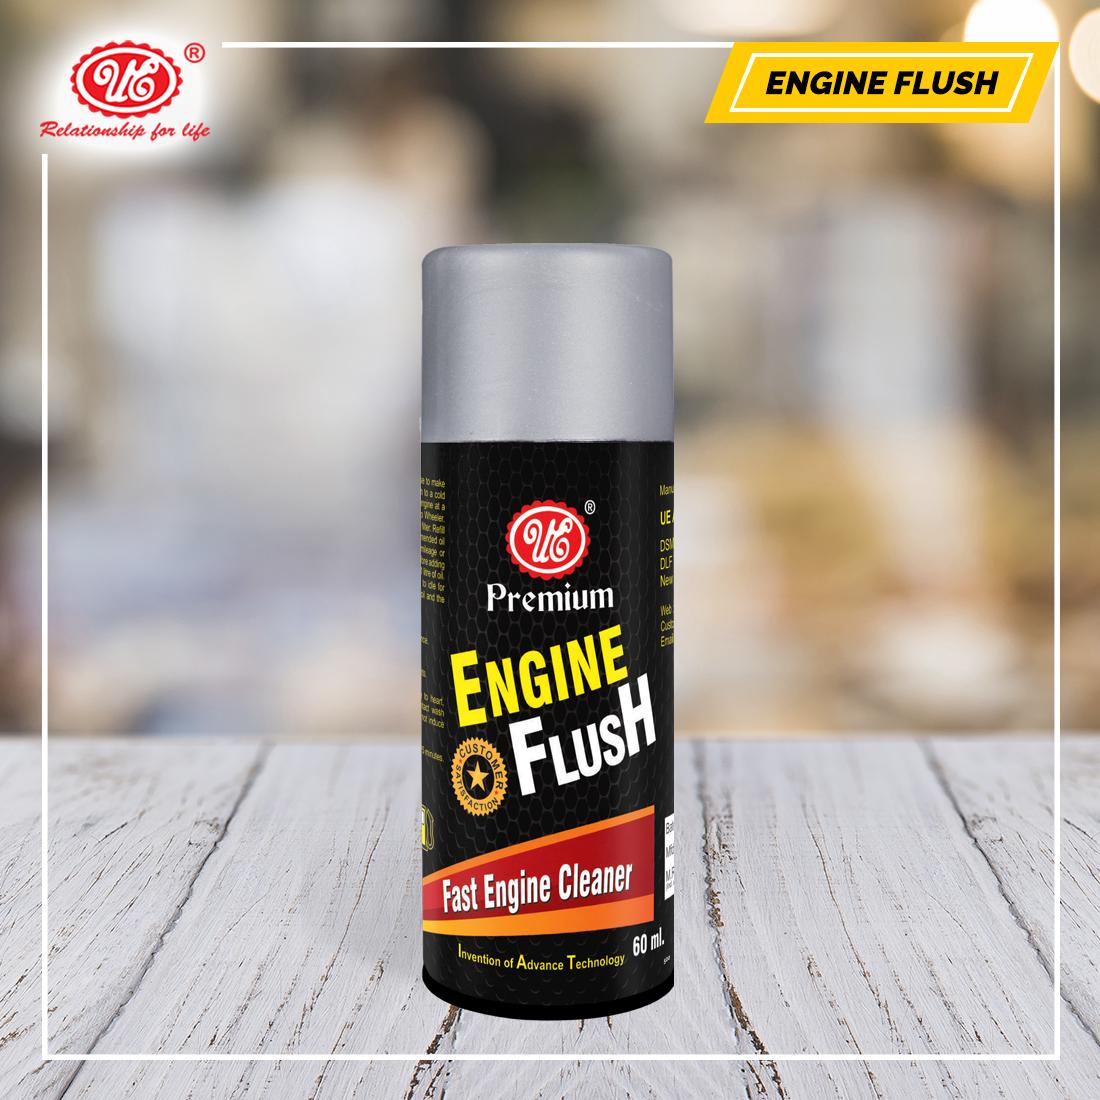 Ue Engine Flush